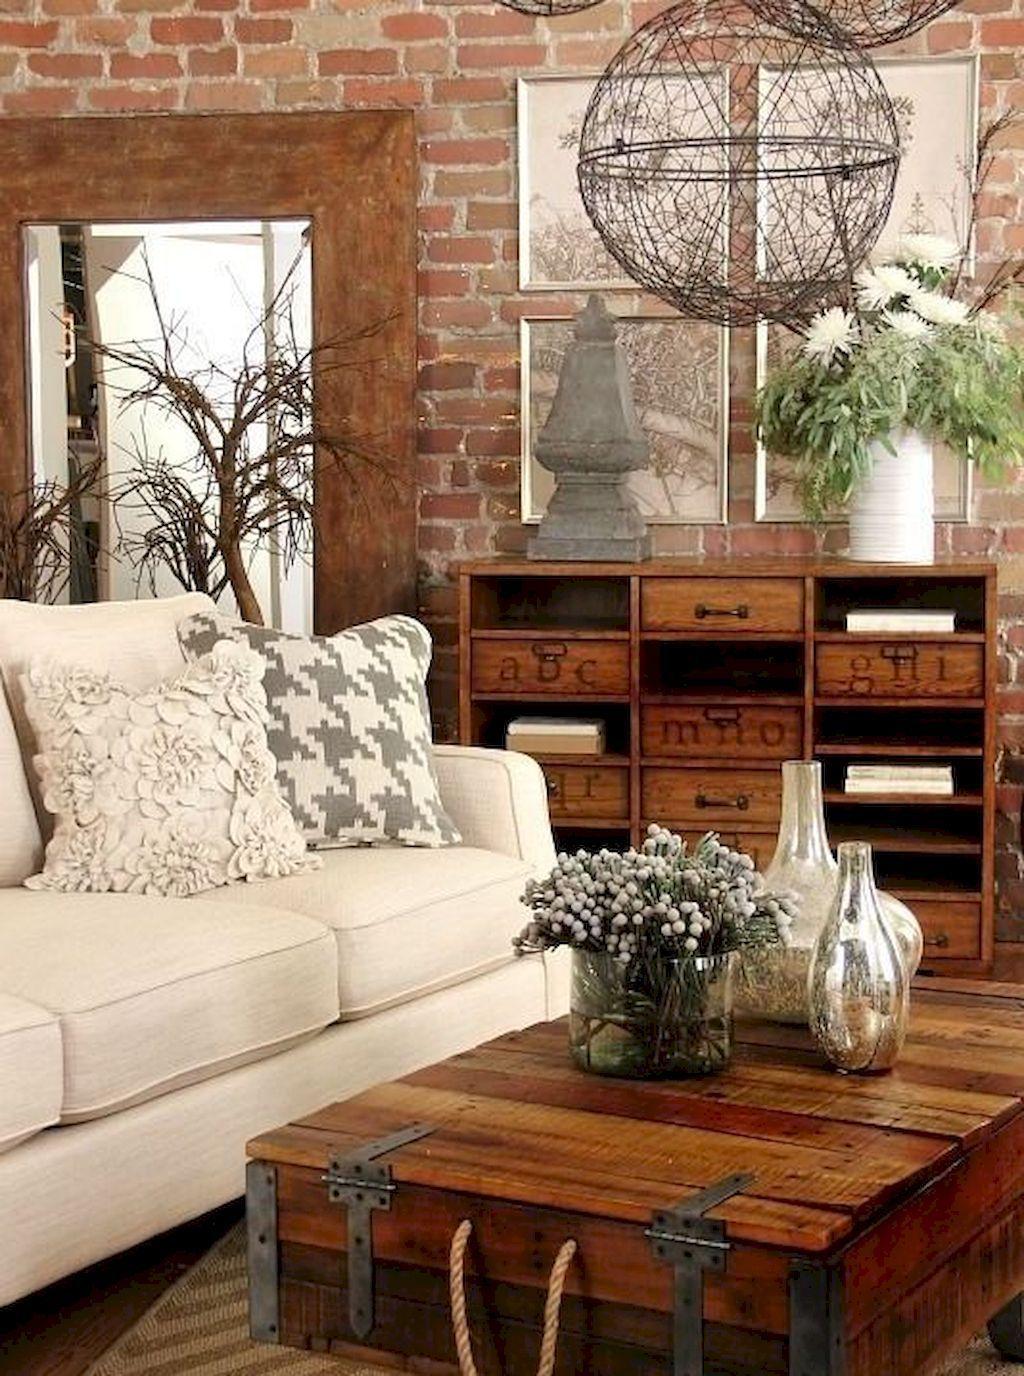 4 Simple Rustic Farmhouse Living Room Decor Ideas: Cozy Farmhouse Living Room Decor Ideas (4)